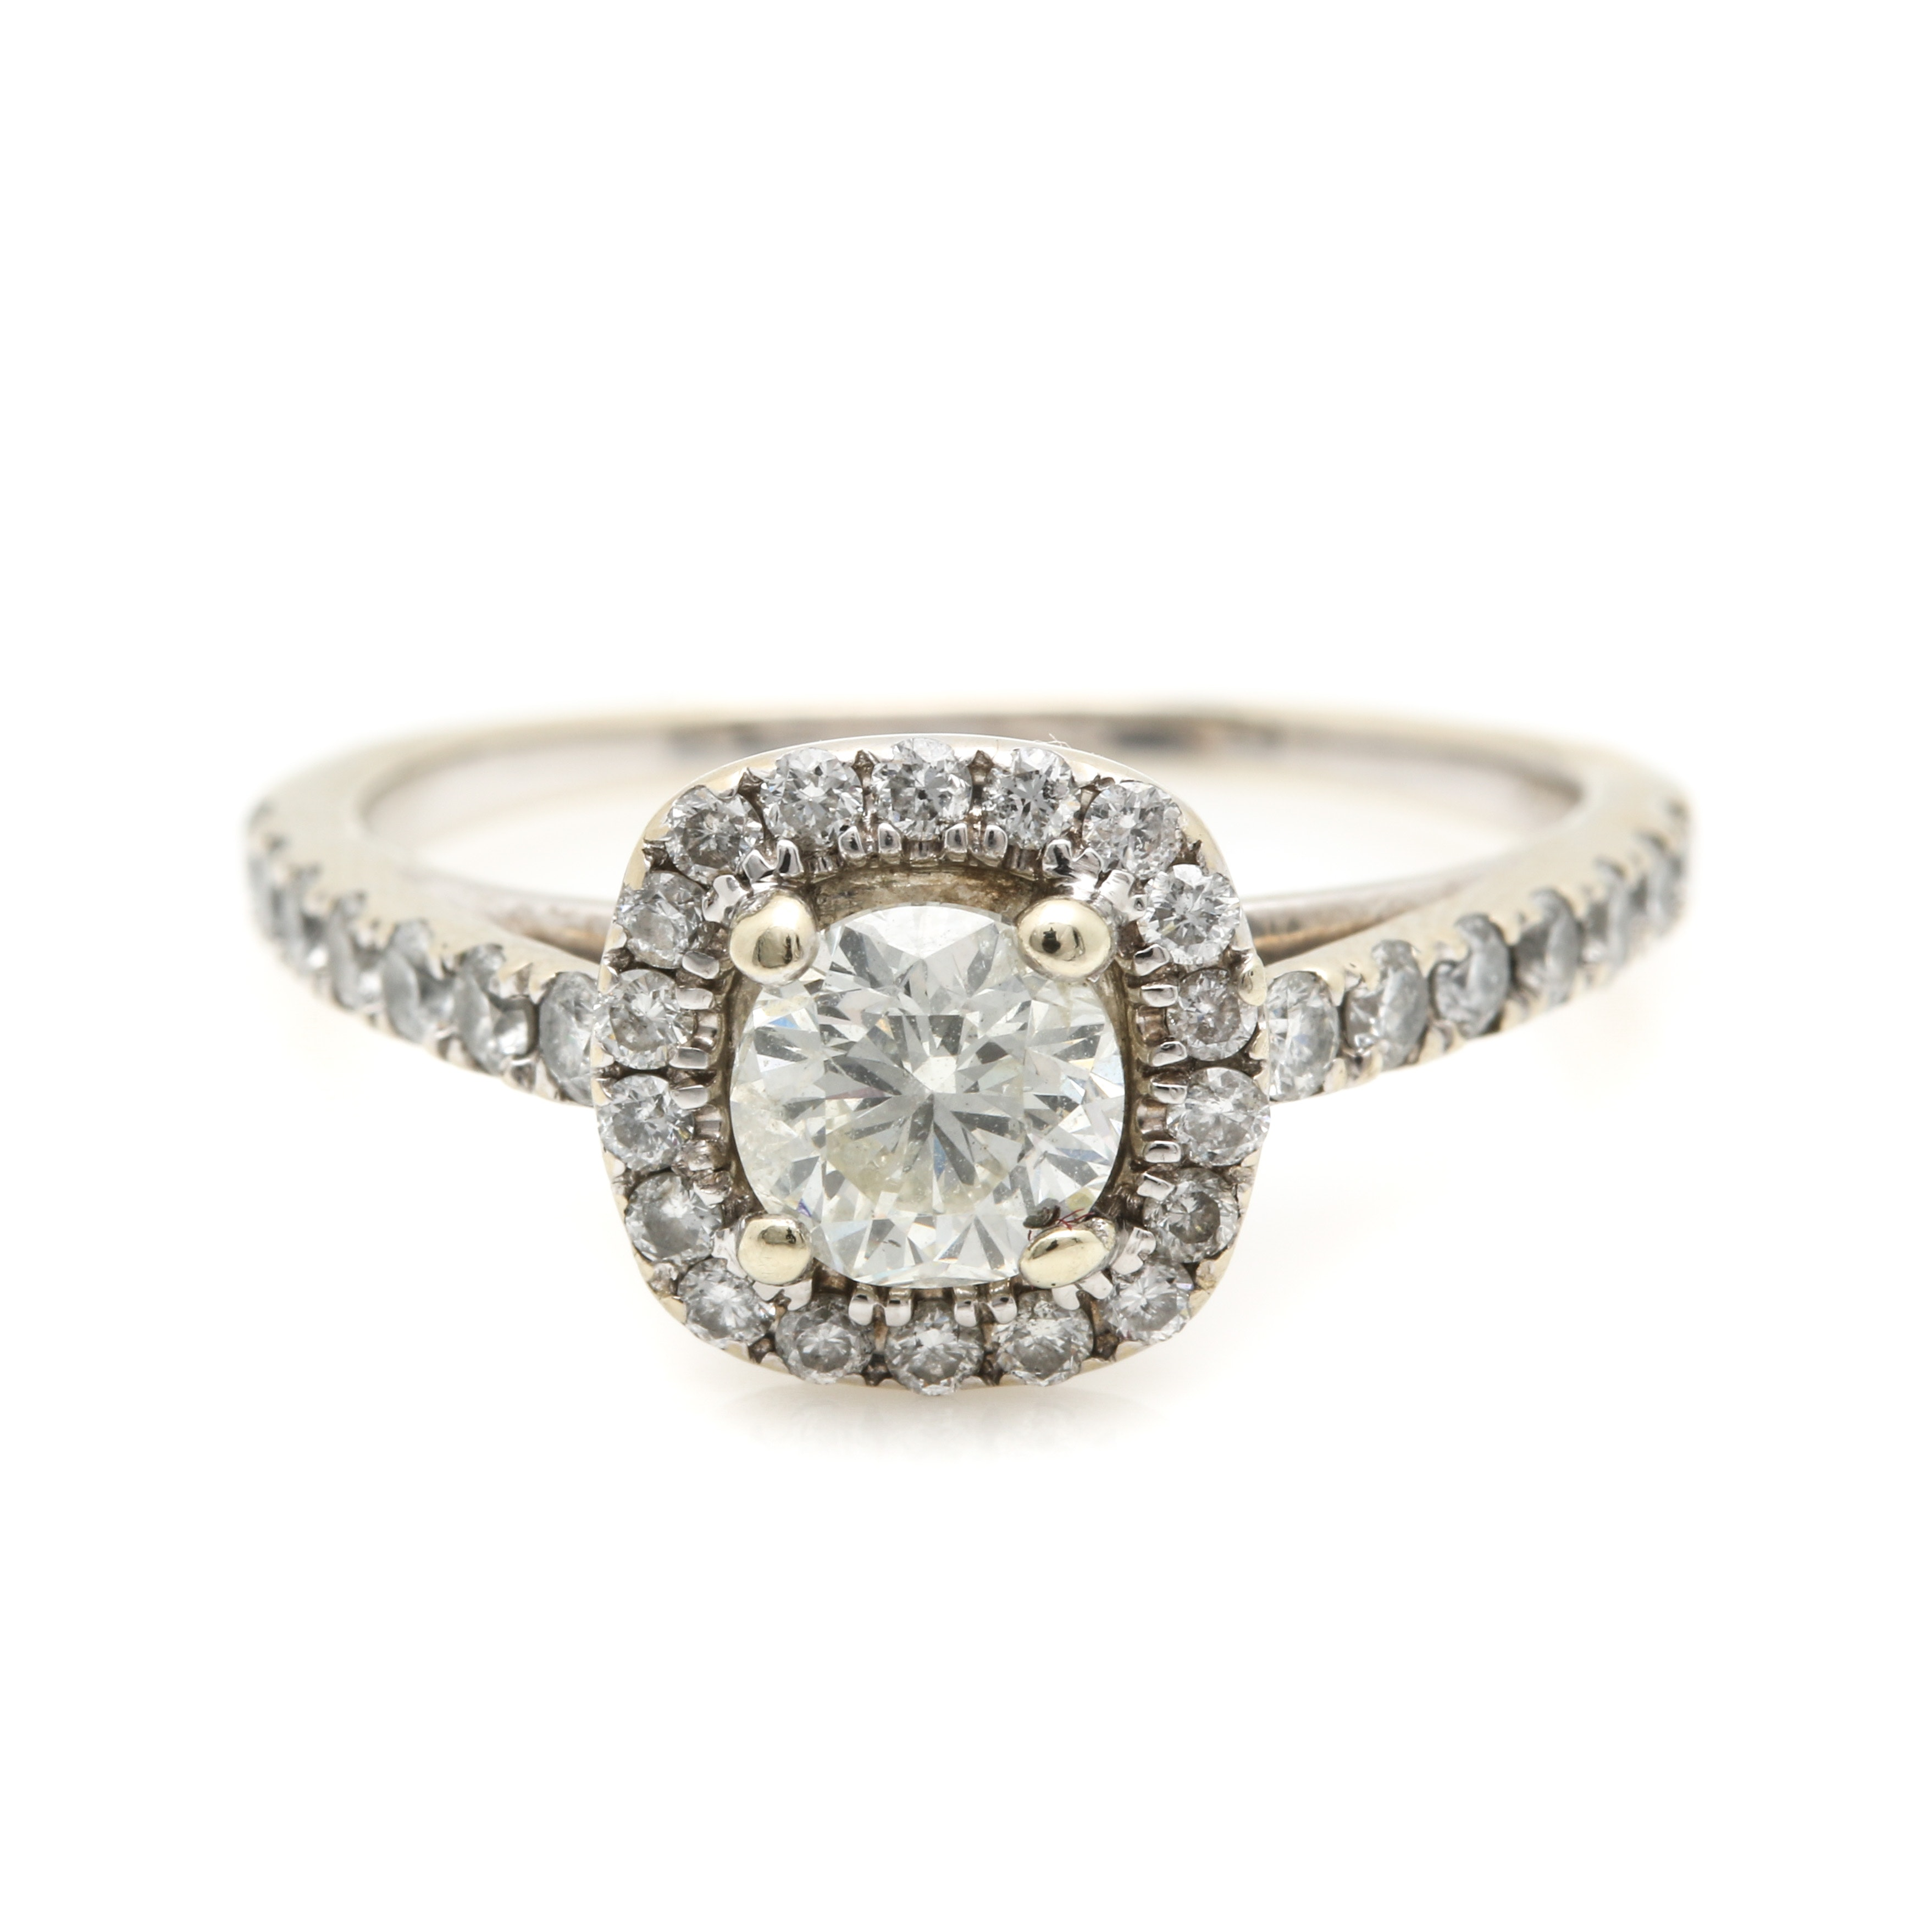 14K White Gold 1.36 CTW Diamond Ring